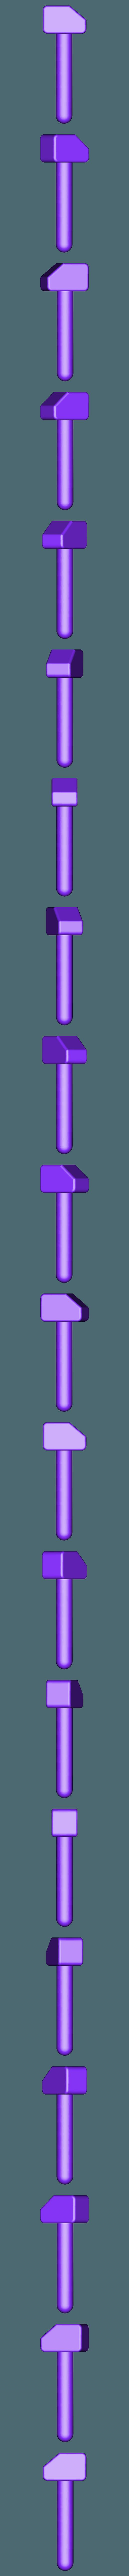 playmobil_hammer.stl Download free STL file Playmobil toolbox with tools • 3D printable template, sokinkeso